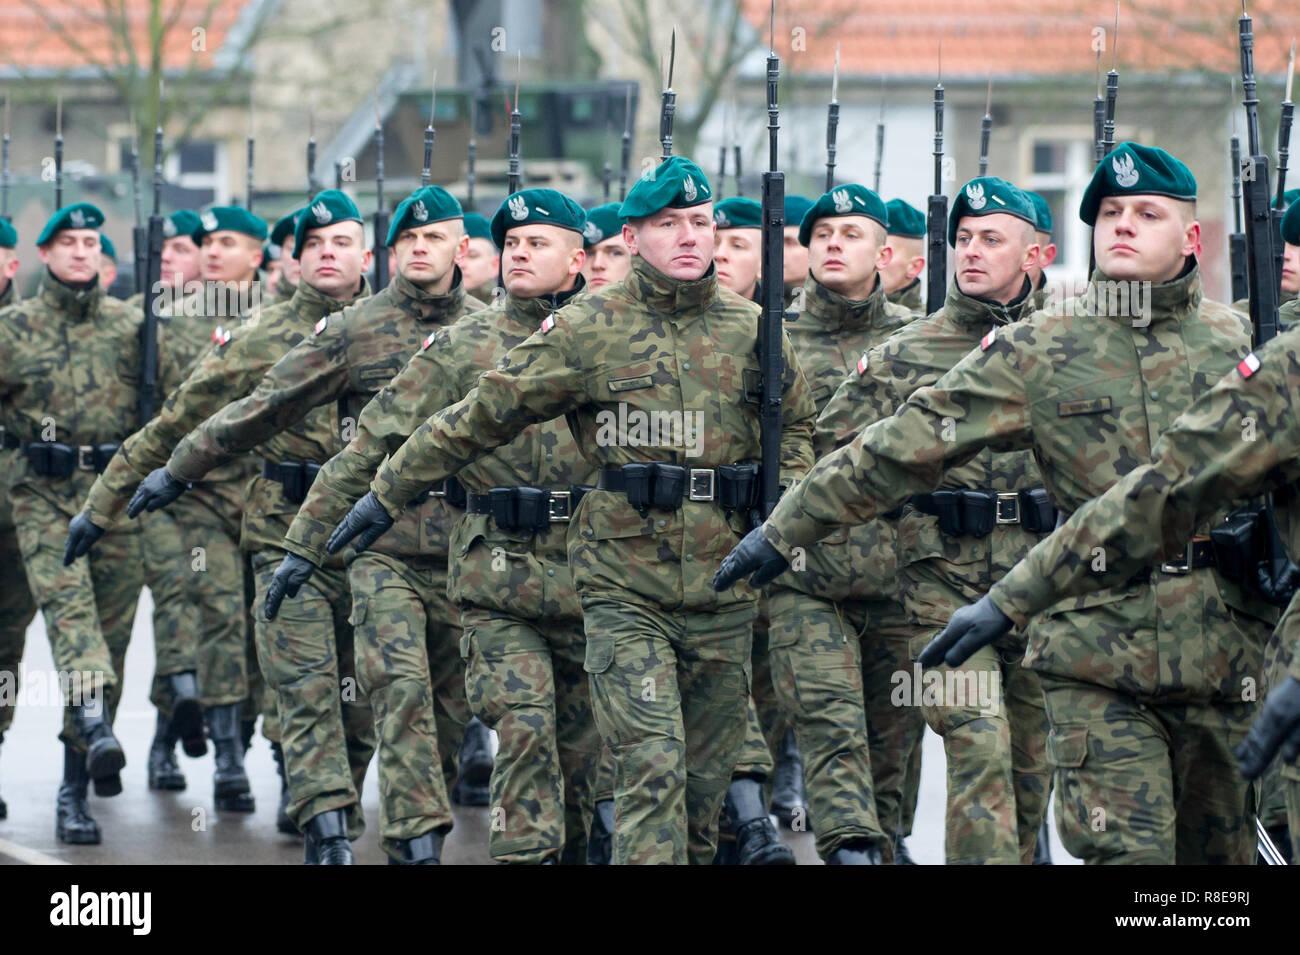 Multinational Division North East MND-NE Headquarters in Elblag, Poland. December 6th 2018 © Wojciech Strozyk / Alamy Stock Photo - Stock Image